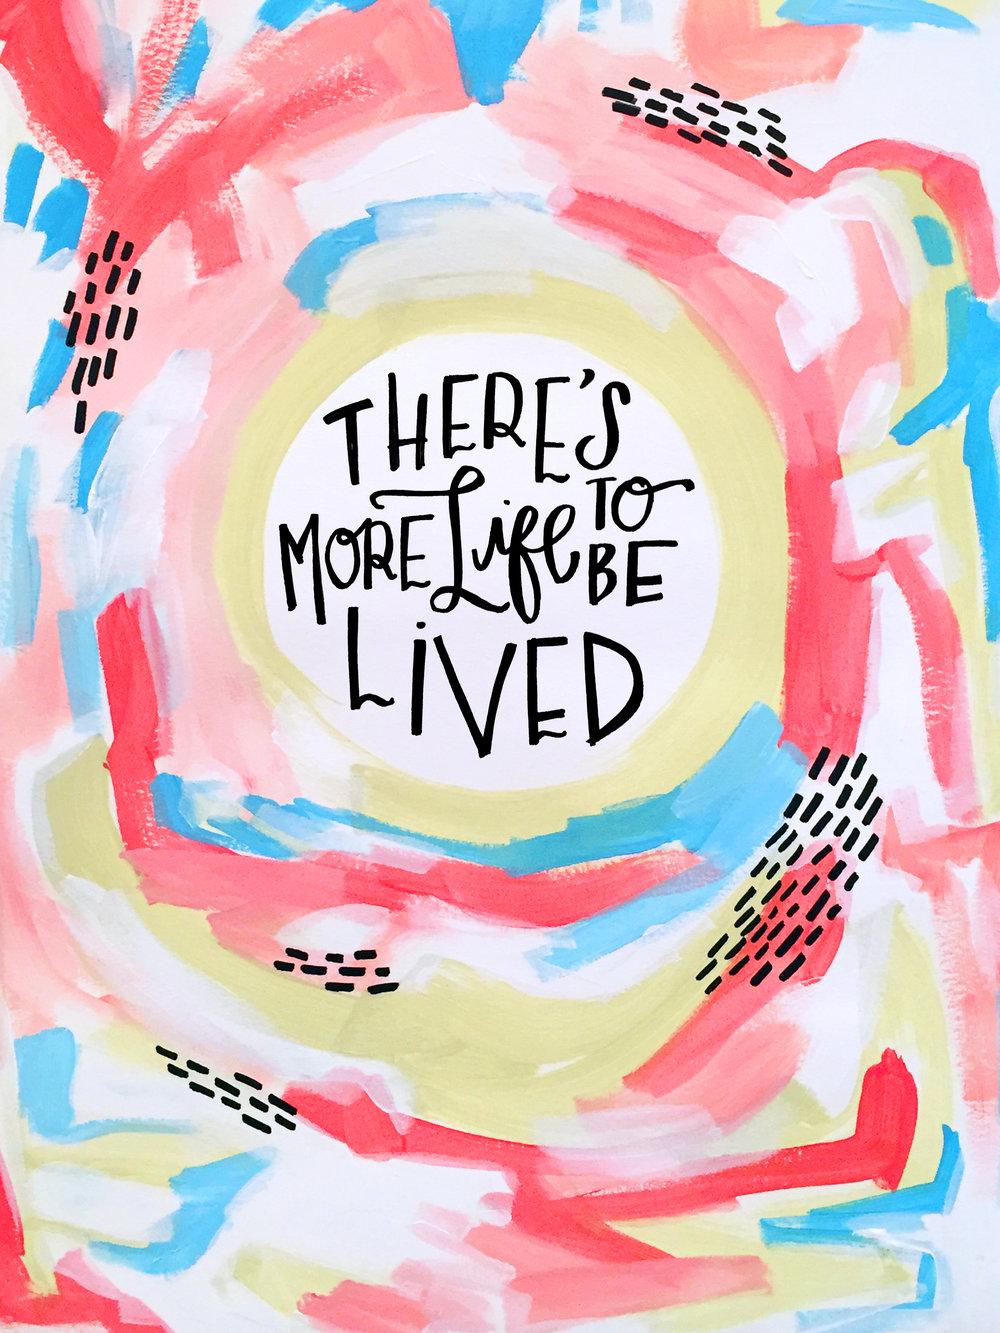 2/20/16: Lived